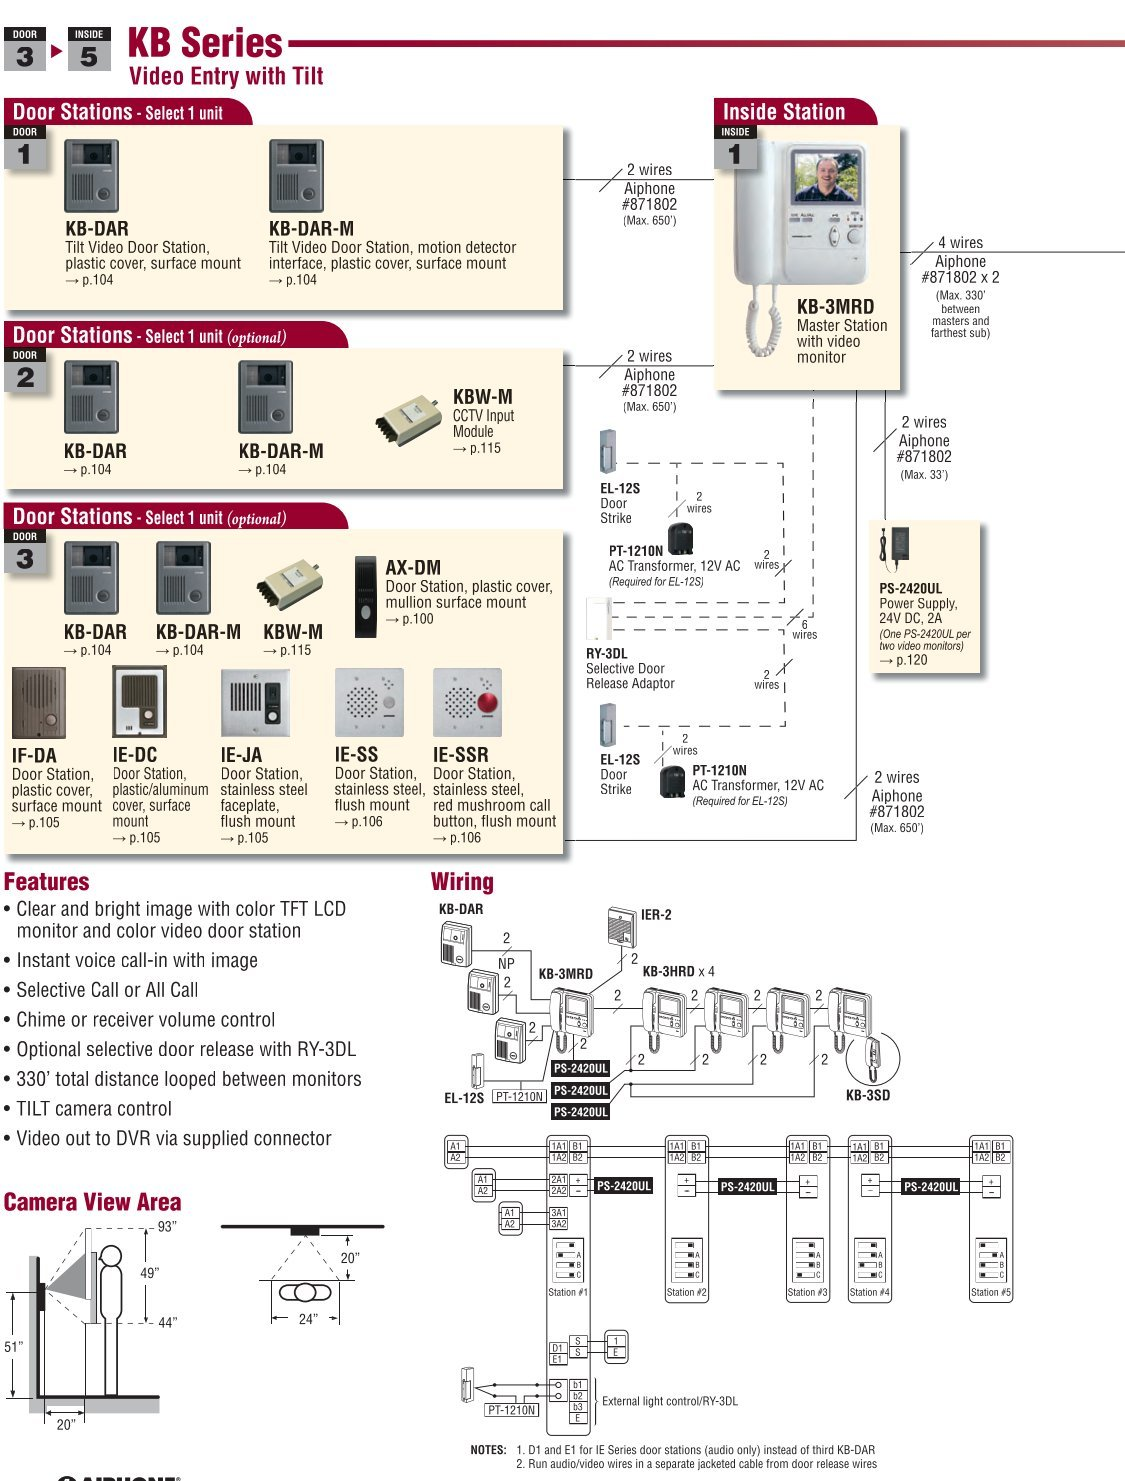 Vintage Nutone Doorbell Wiring Diagram from static-cdn.imageservice.cloud